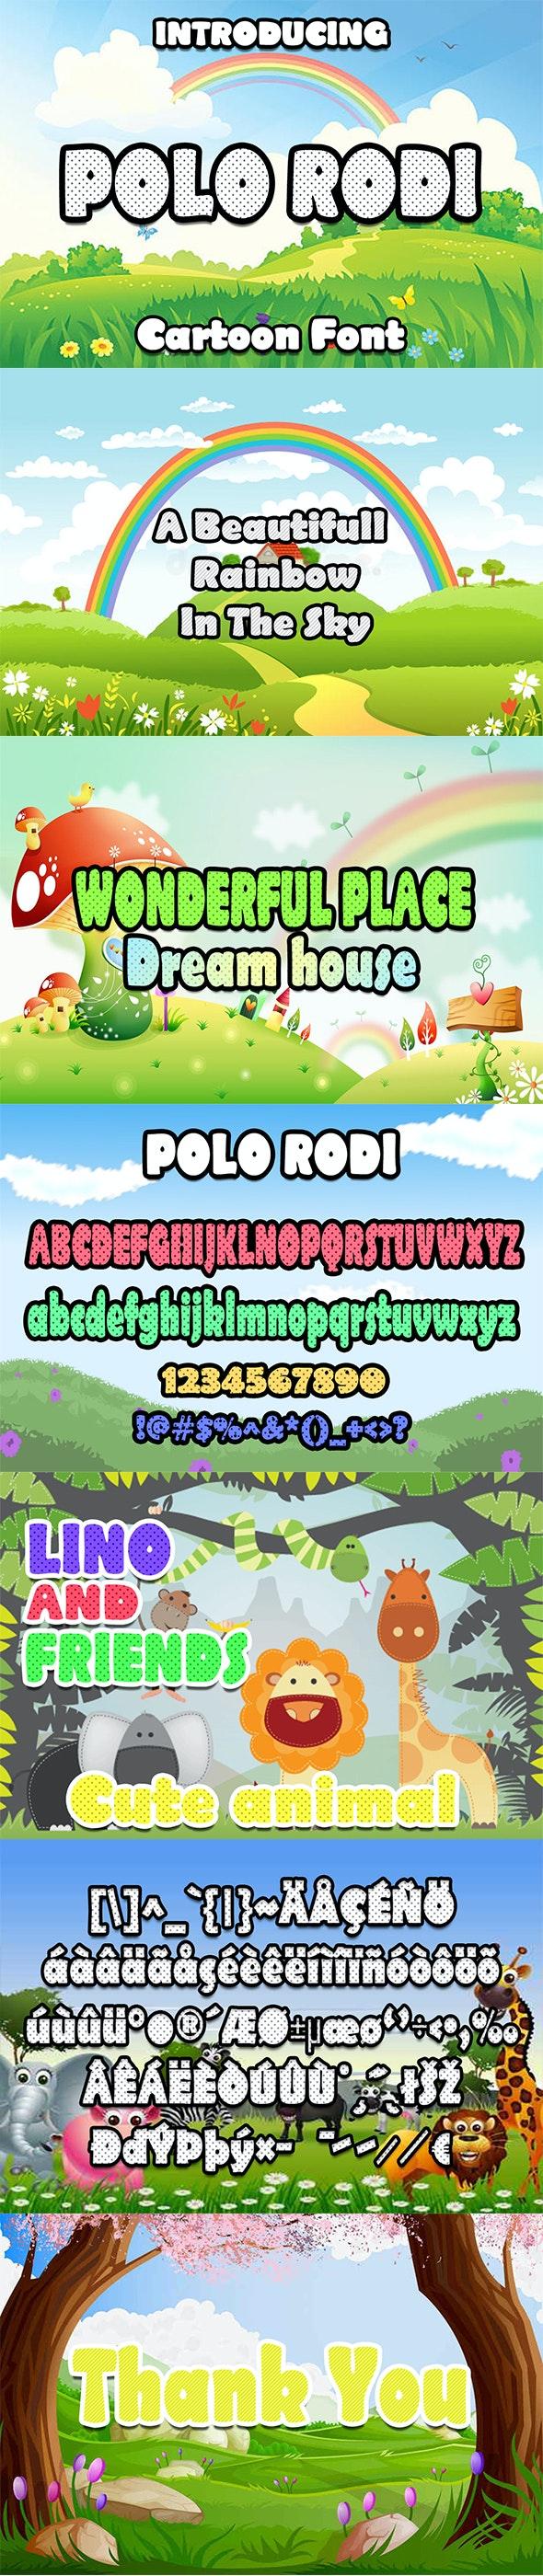 Polo Rodi Cartoon Font - Cool Fonts